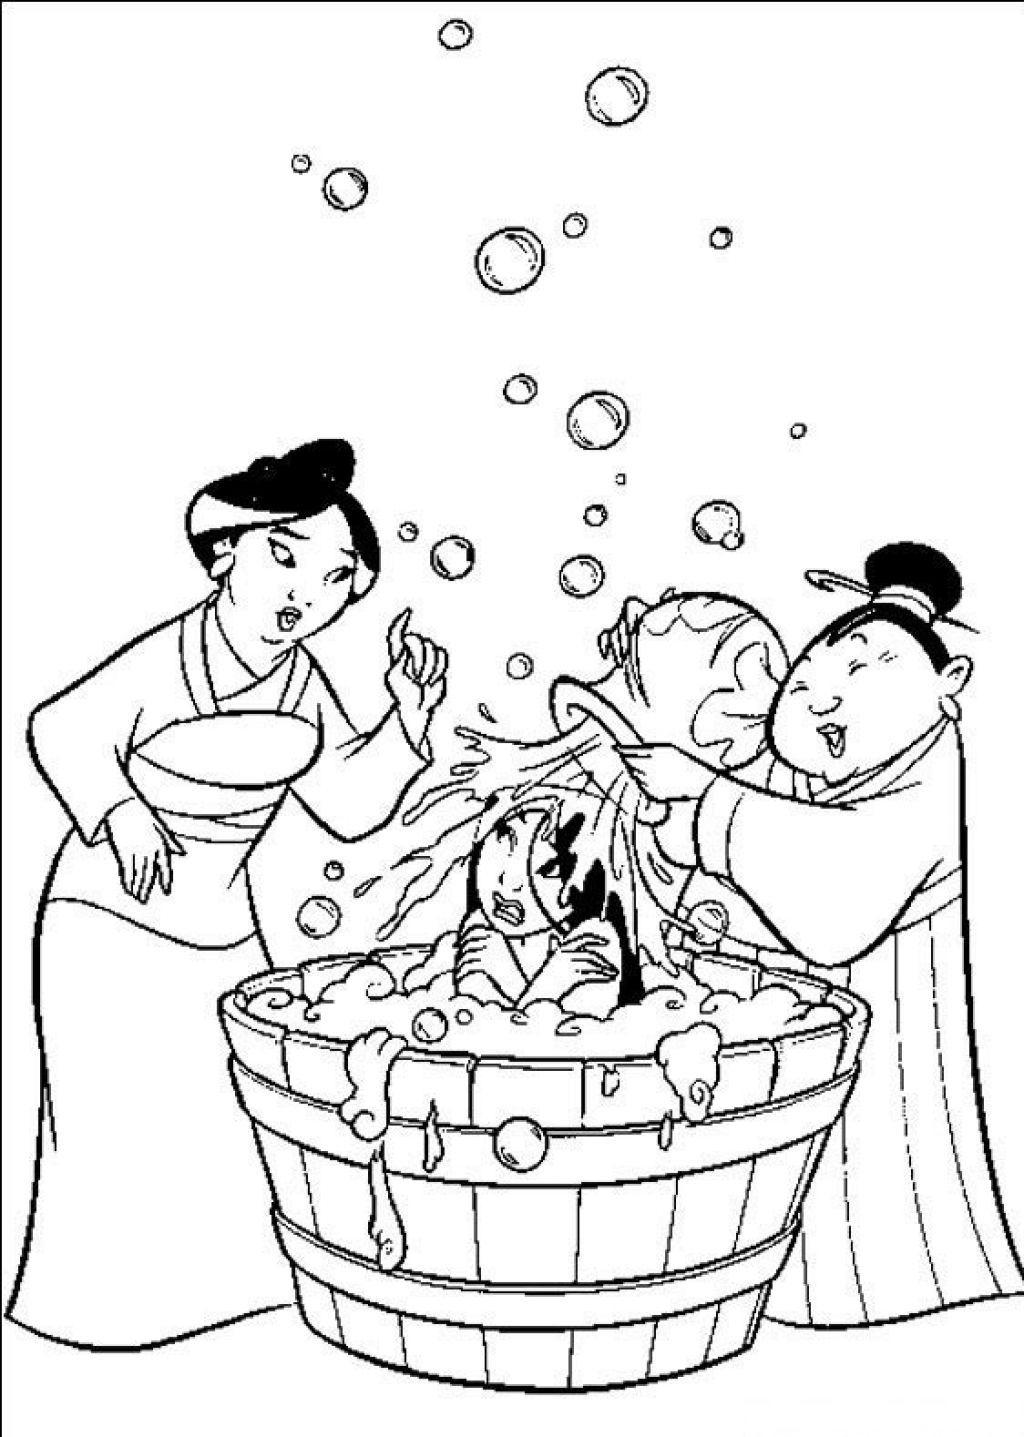 Mulan Coloring Page | Disney Coloring Pages, Princess dedans Coloriage Mulan A Imprimer